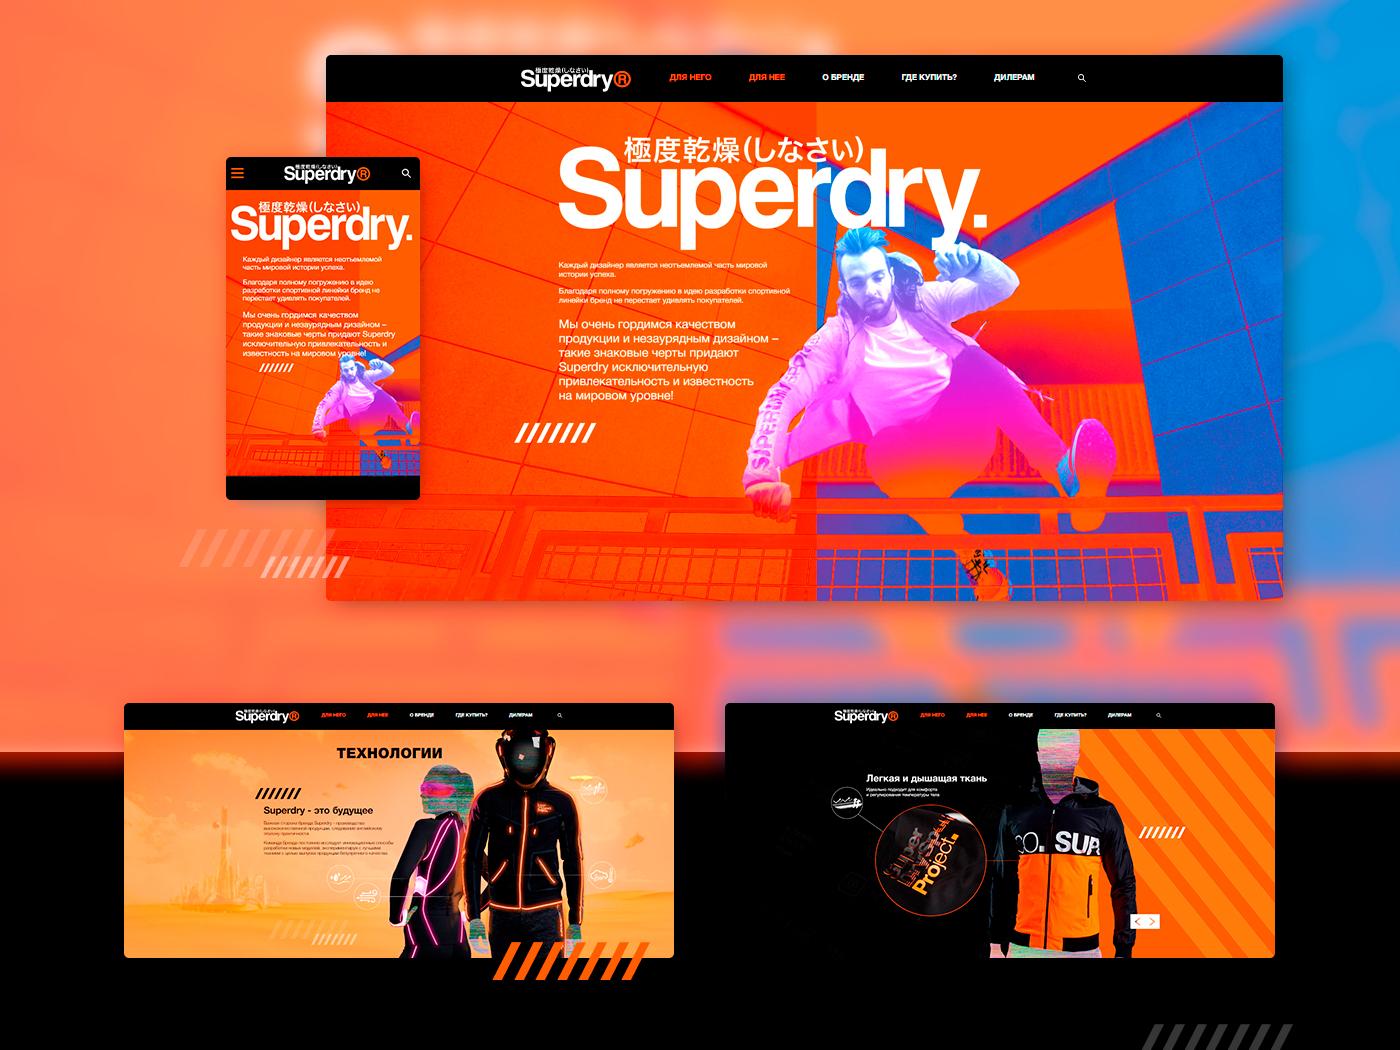 SuperdrySport Russia logo superdrysport superdry sport brandid brand adobe photoshop adobe illustrator design